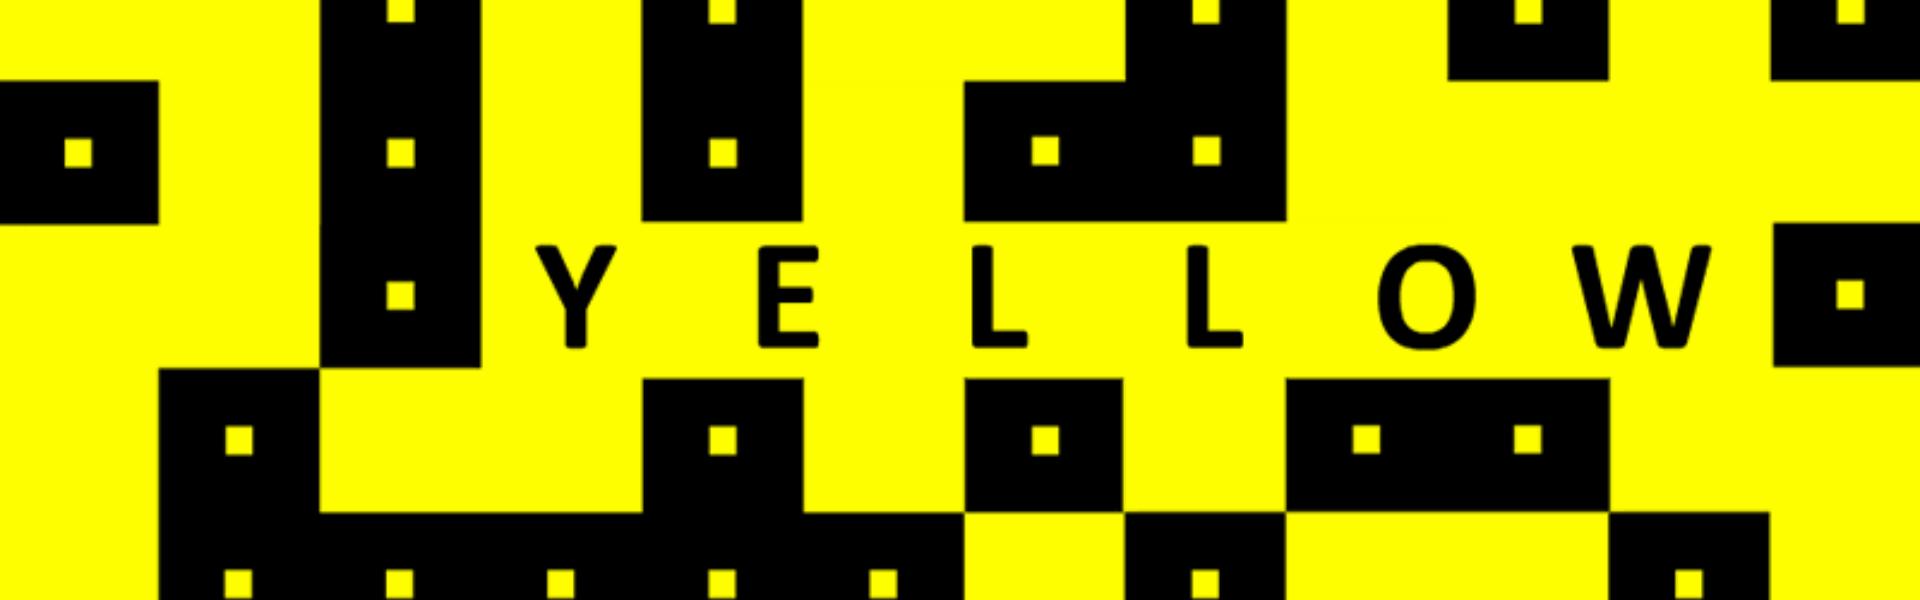 yellow-featured.jpg